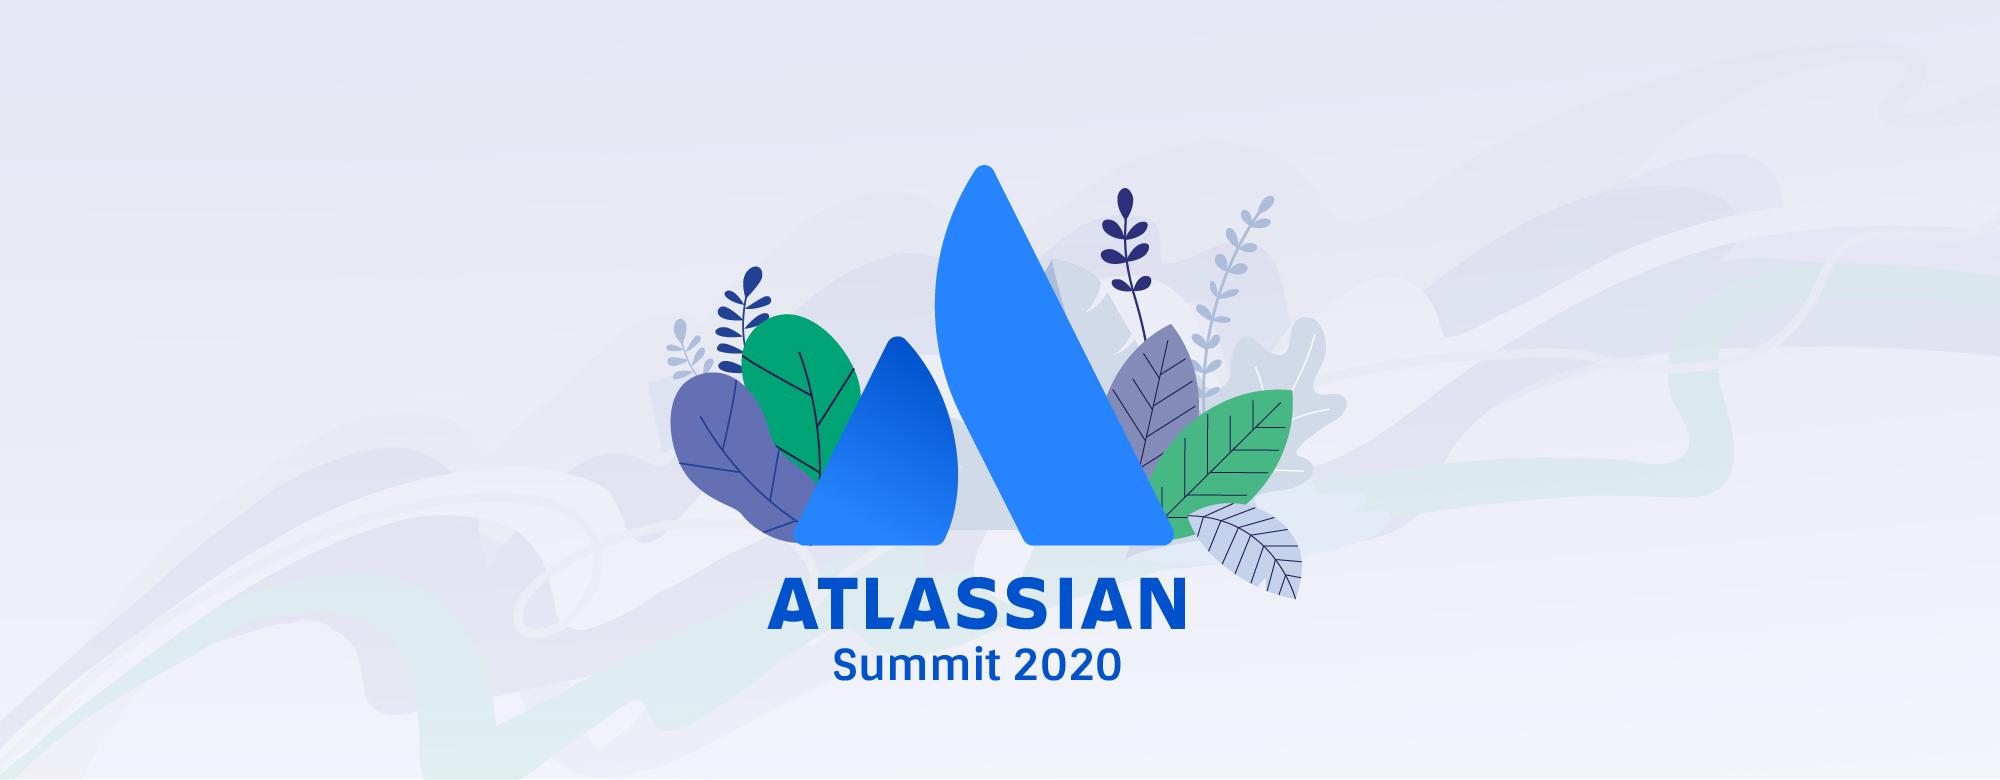 Going Green at Atlassian Summit 2020